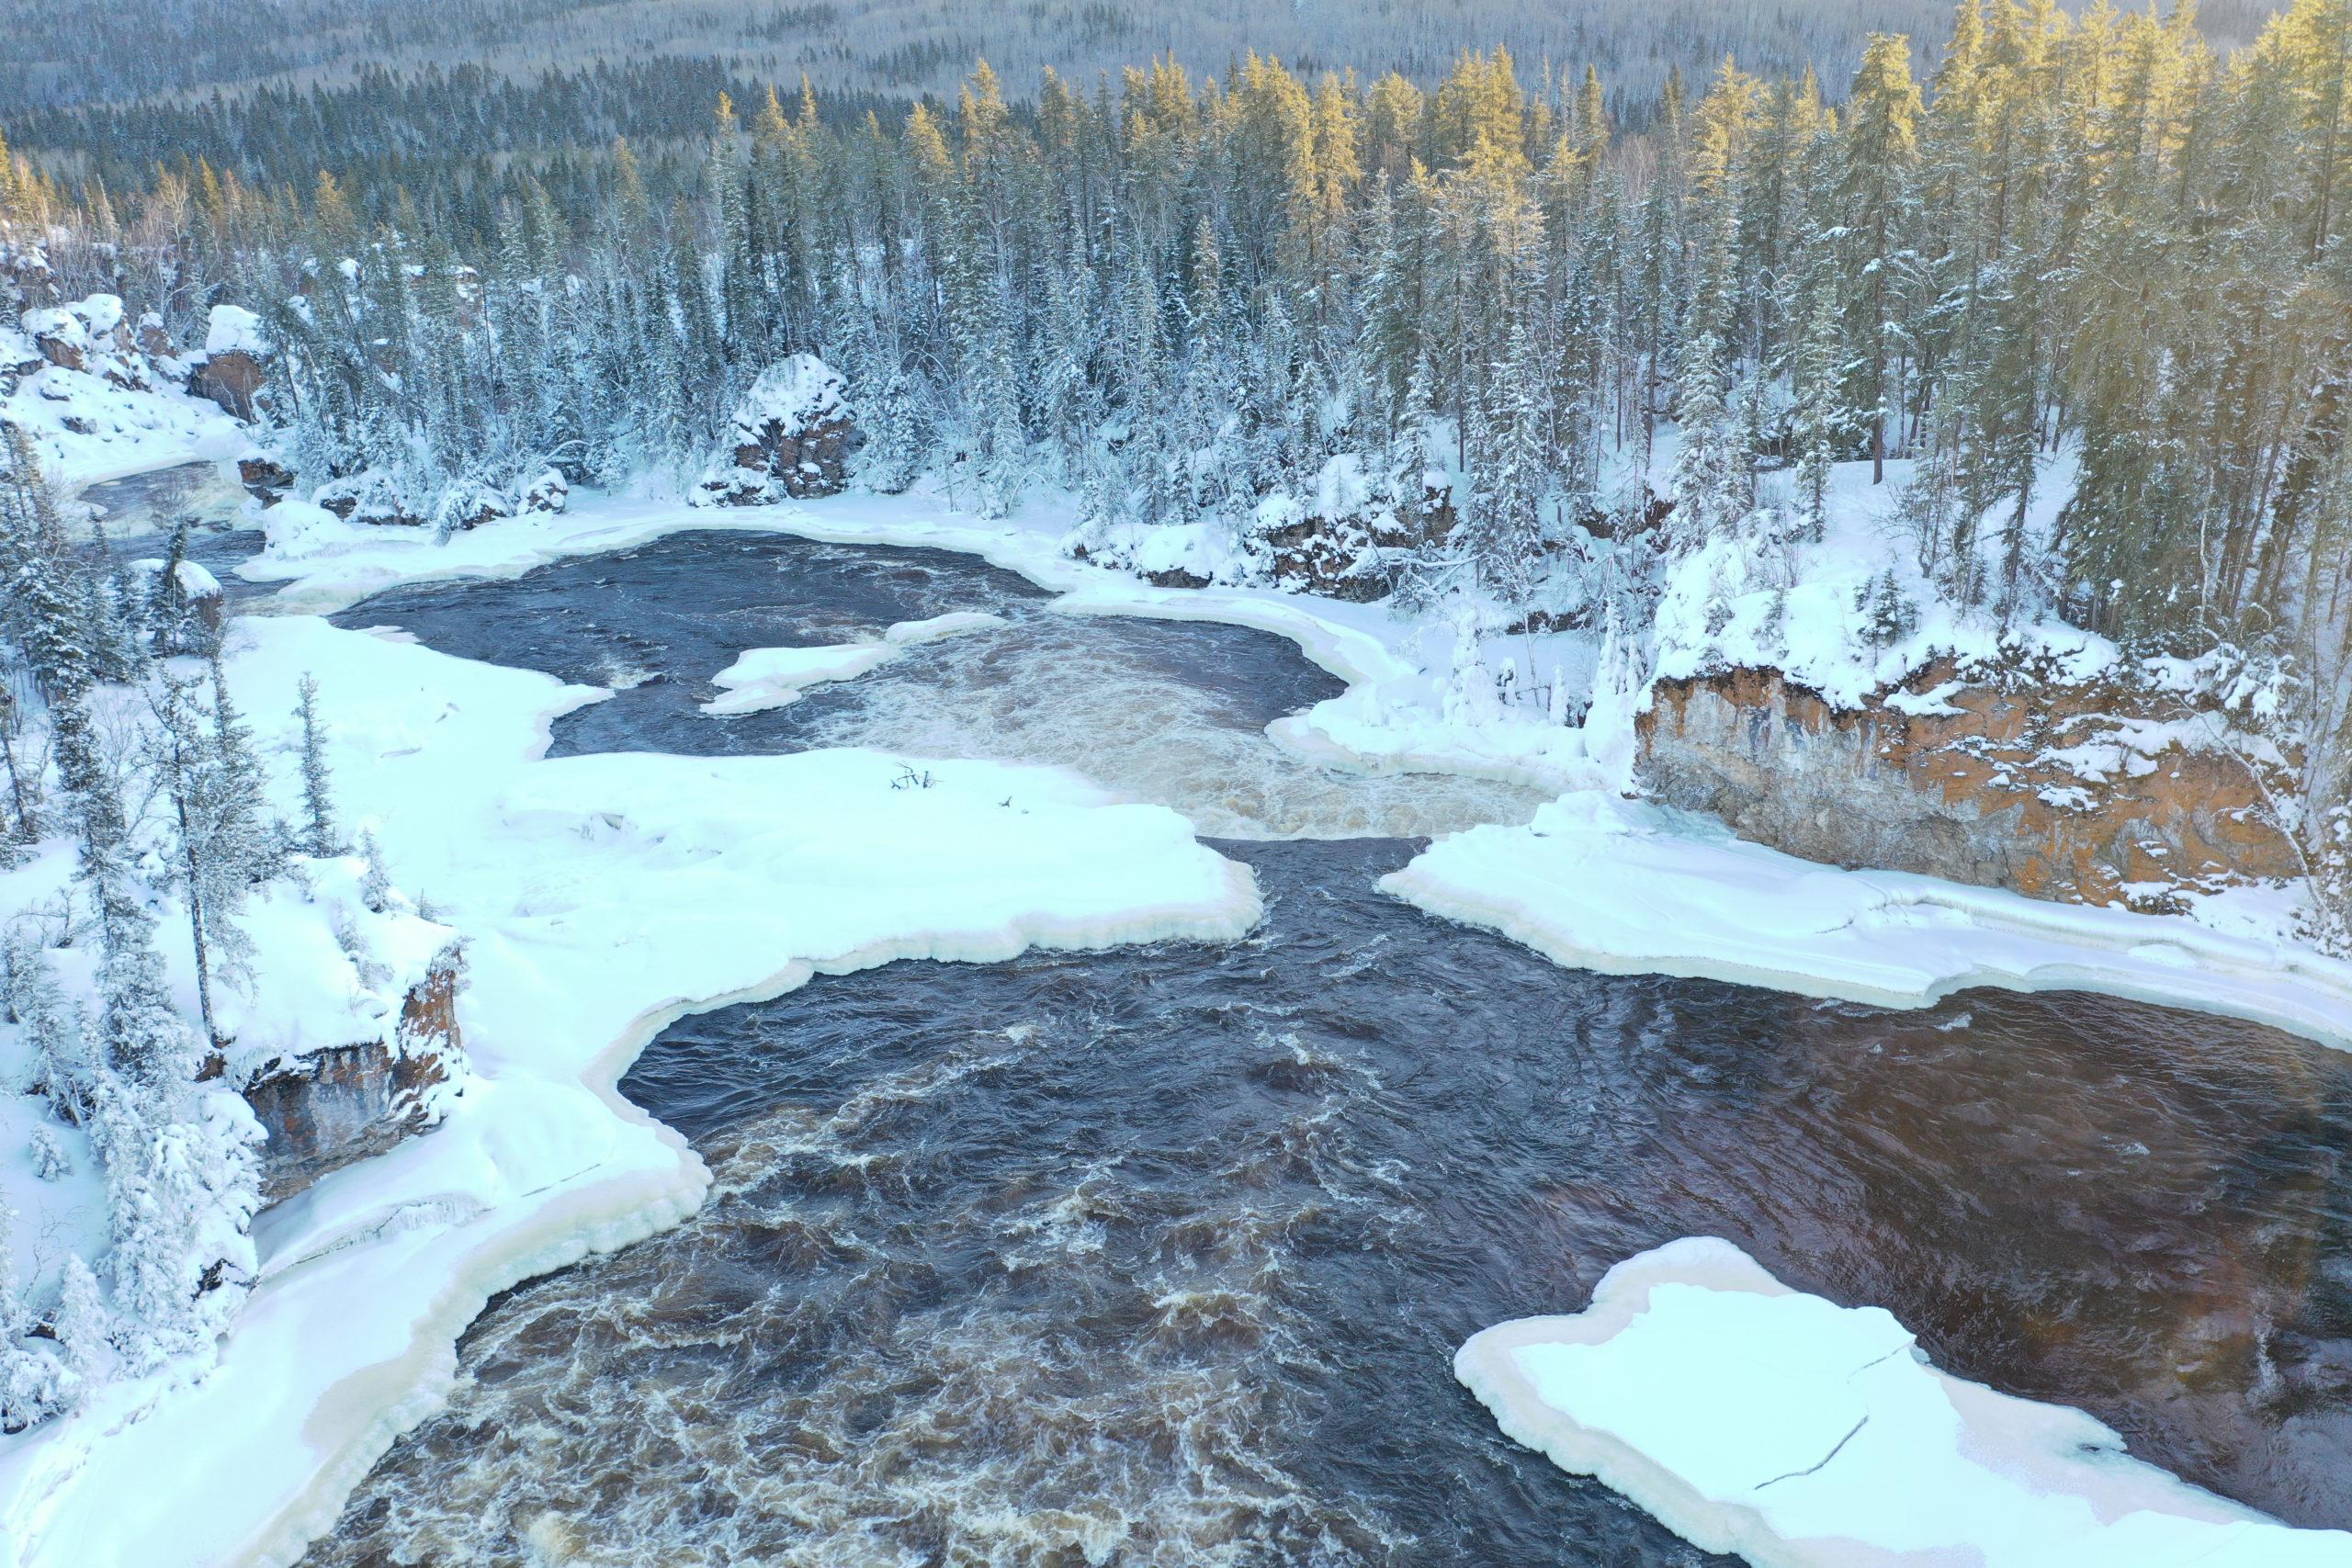 Whitemud Falls